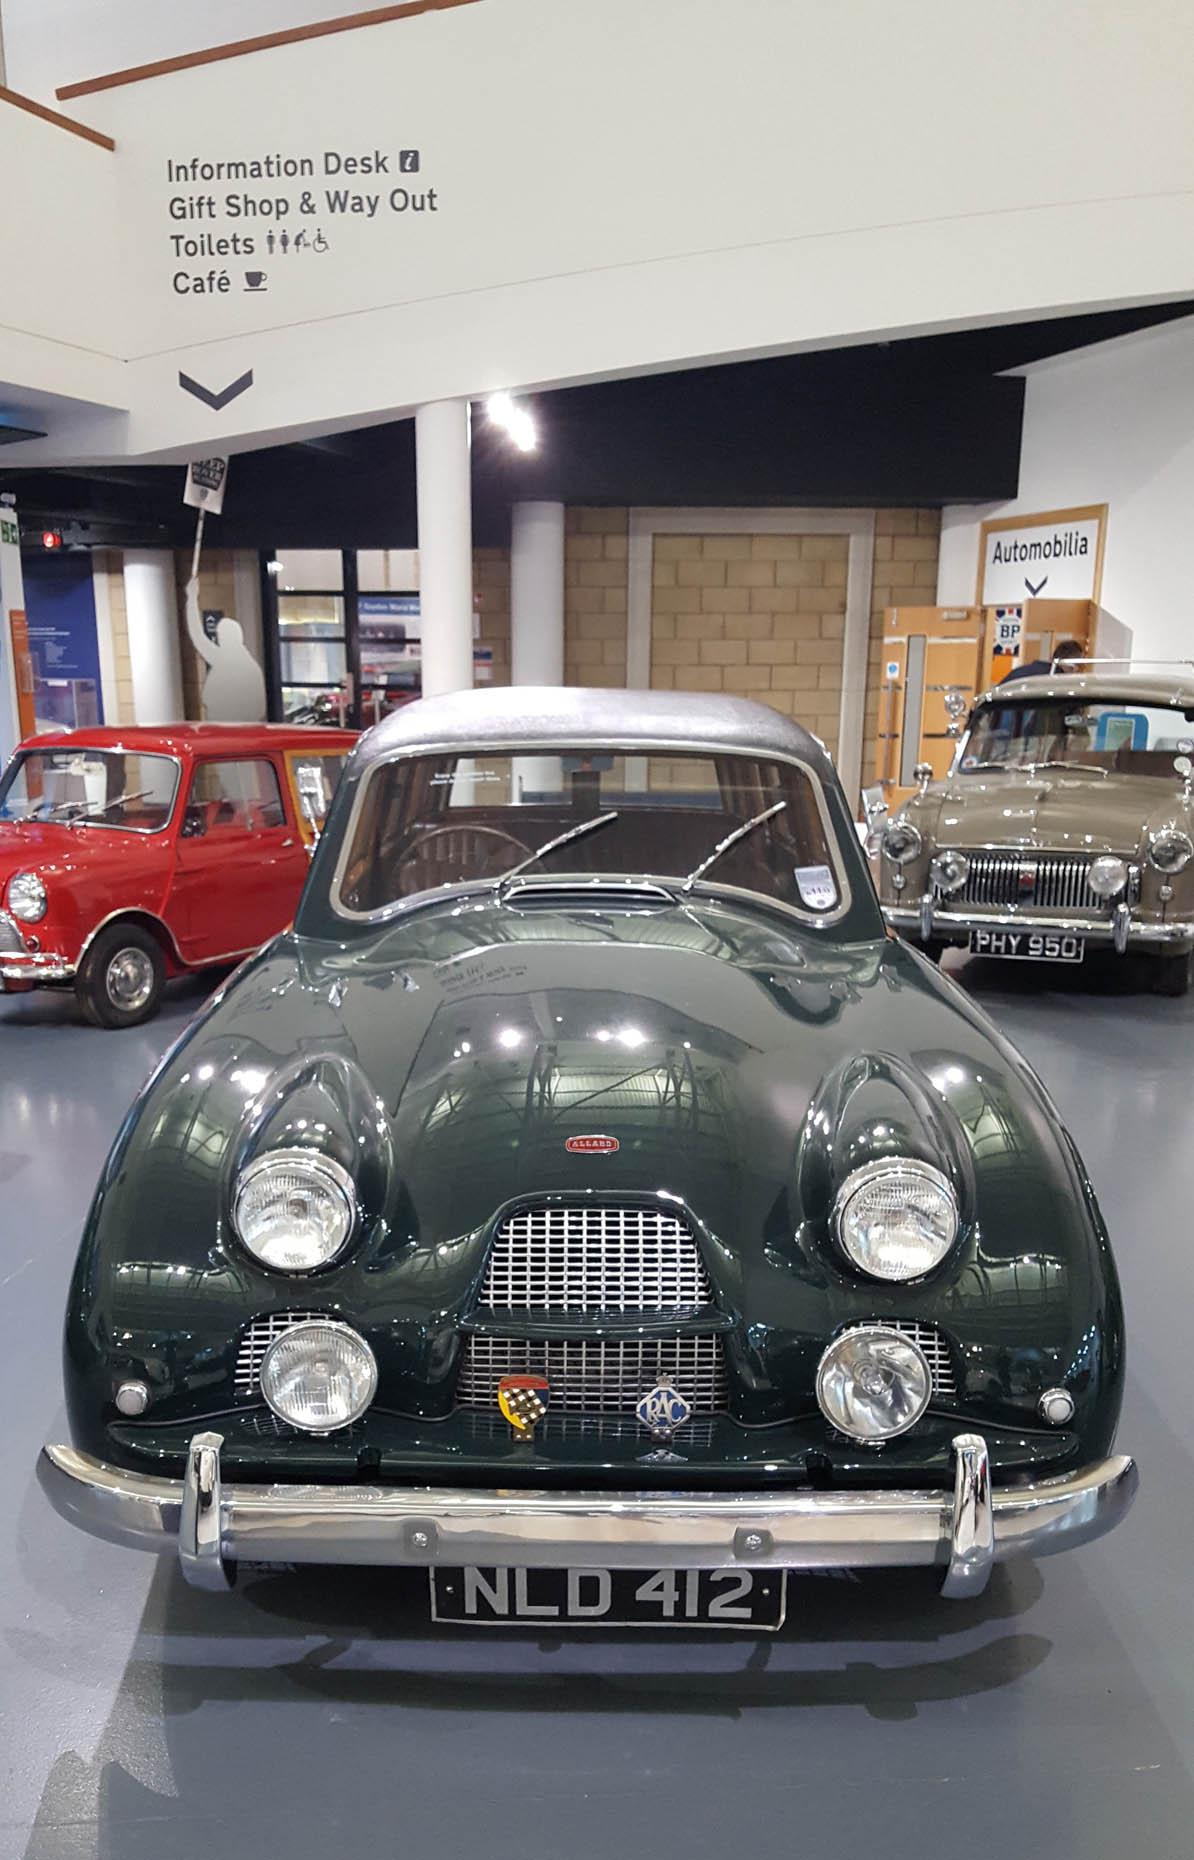 Allard P2 Safari Station Wagon - wizytą w British Motor Museum by LONG STORY SHORT